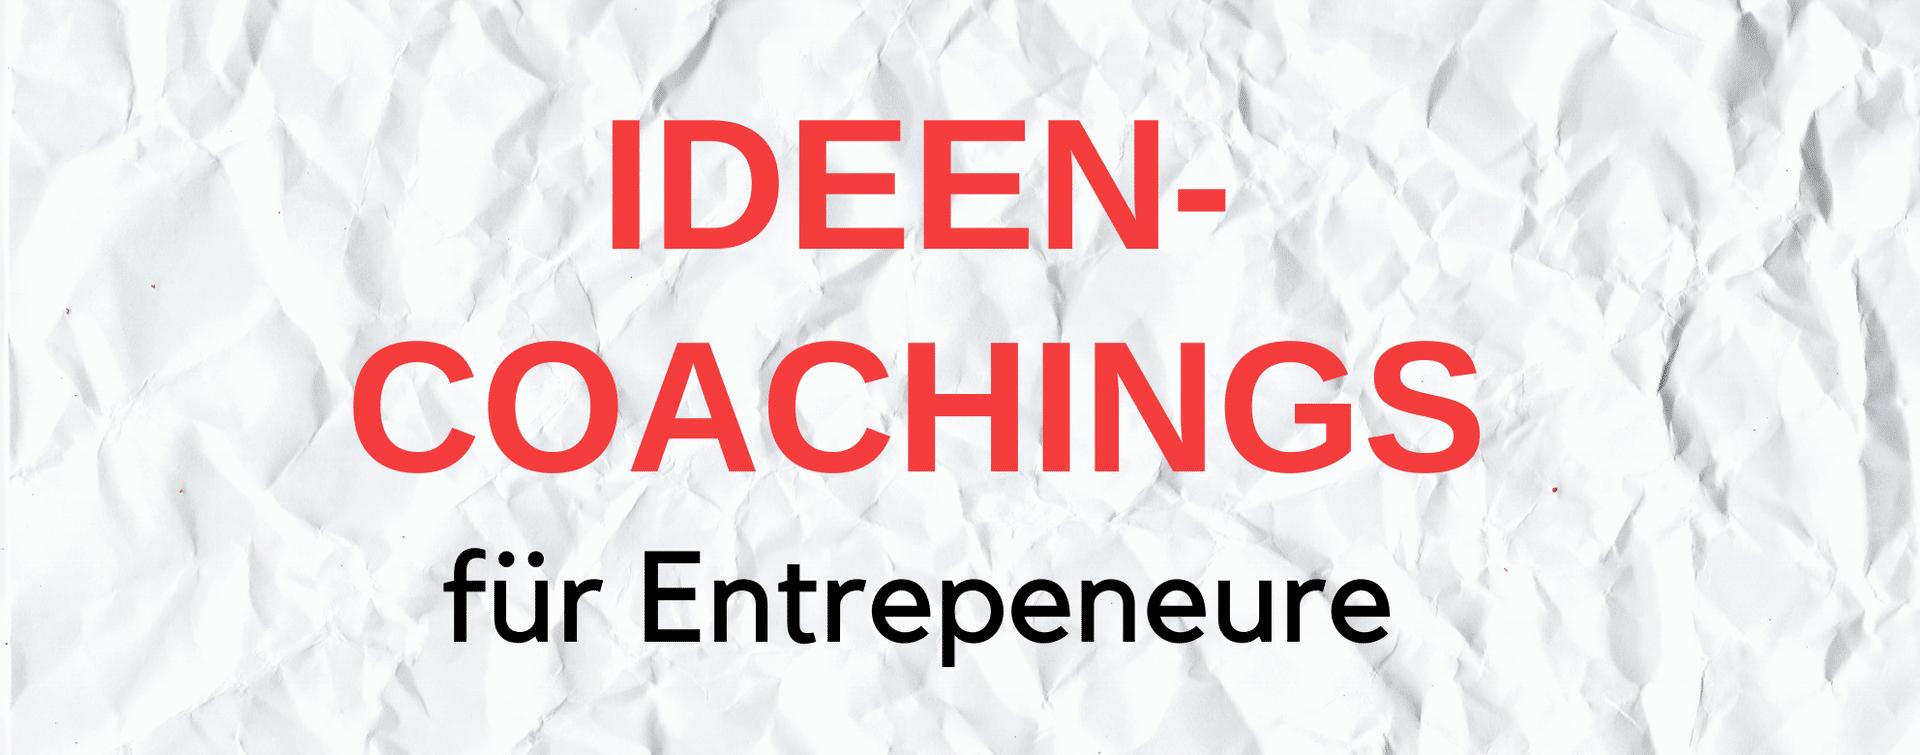 Ideen-coachings-fuer-entrepreneure